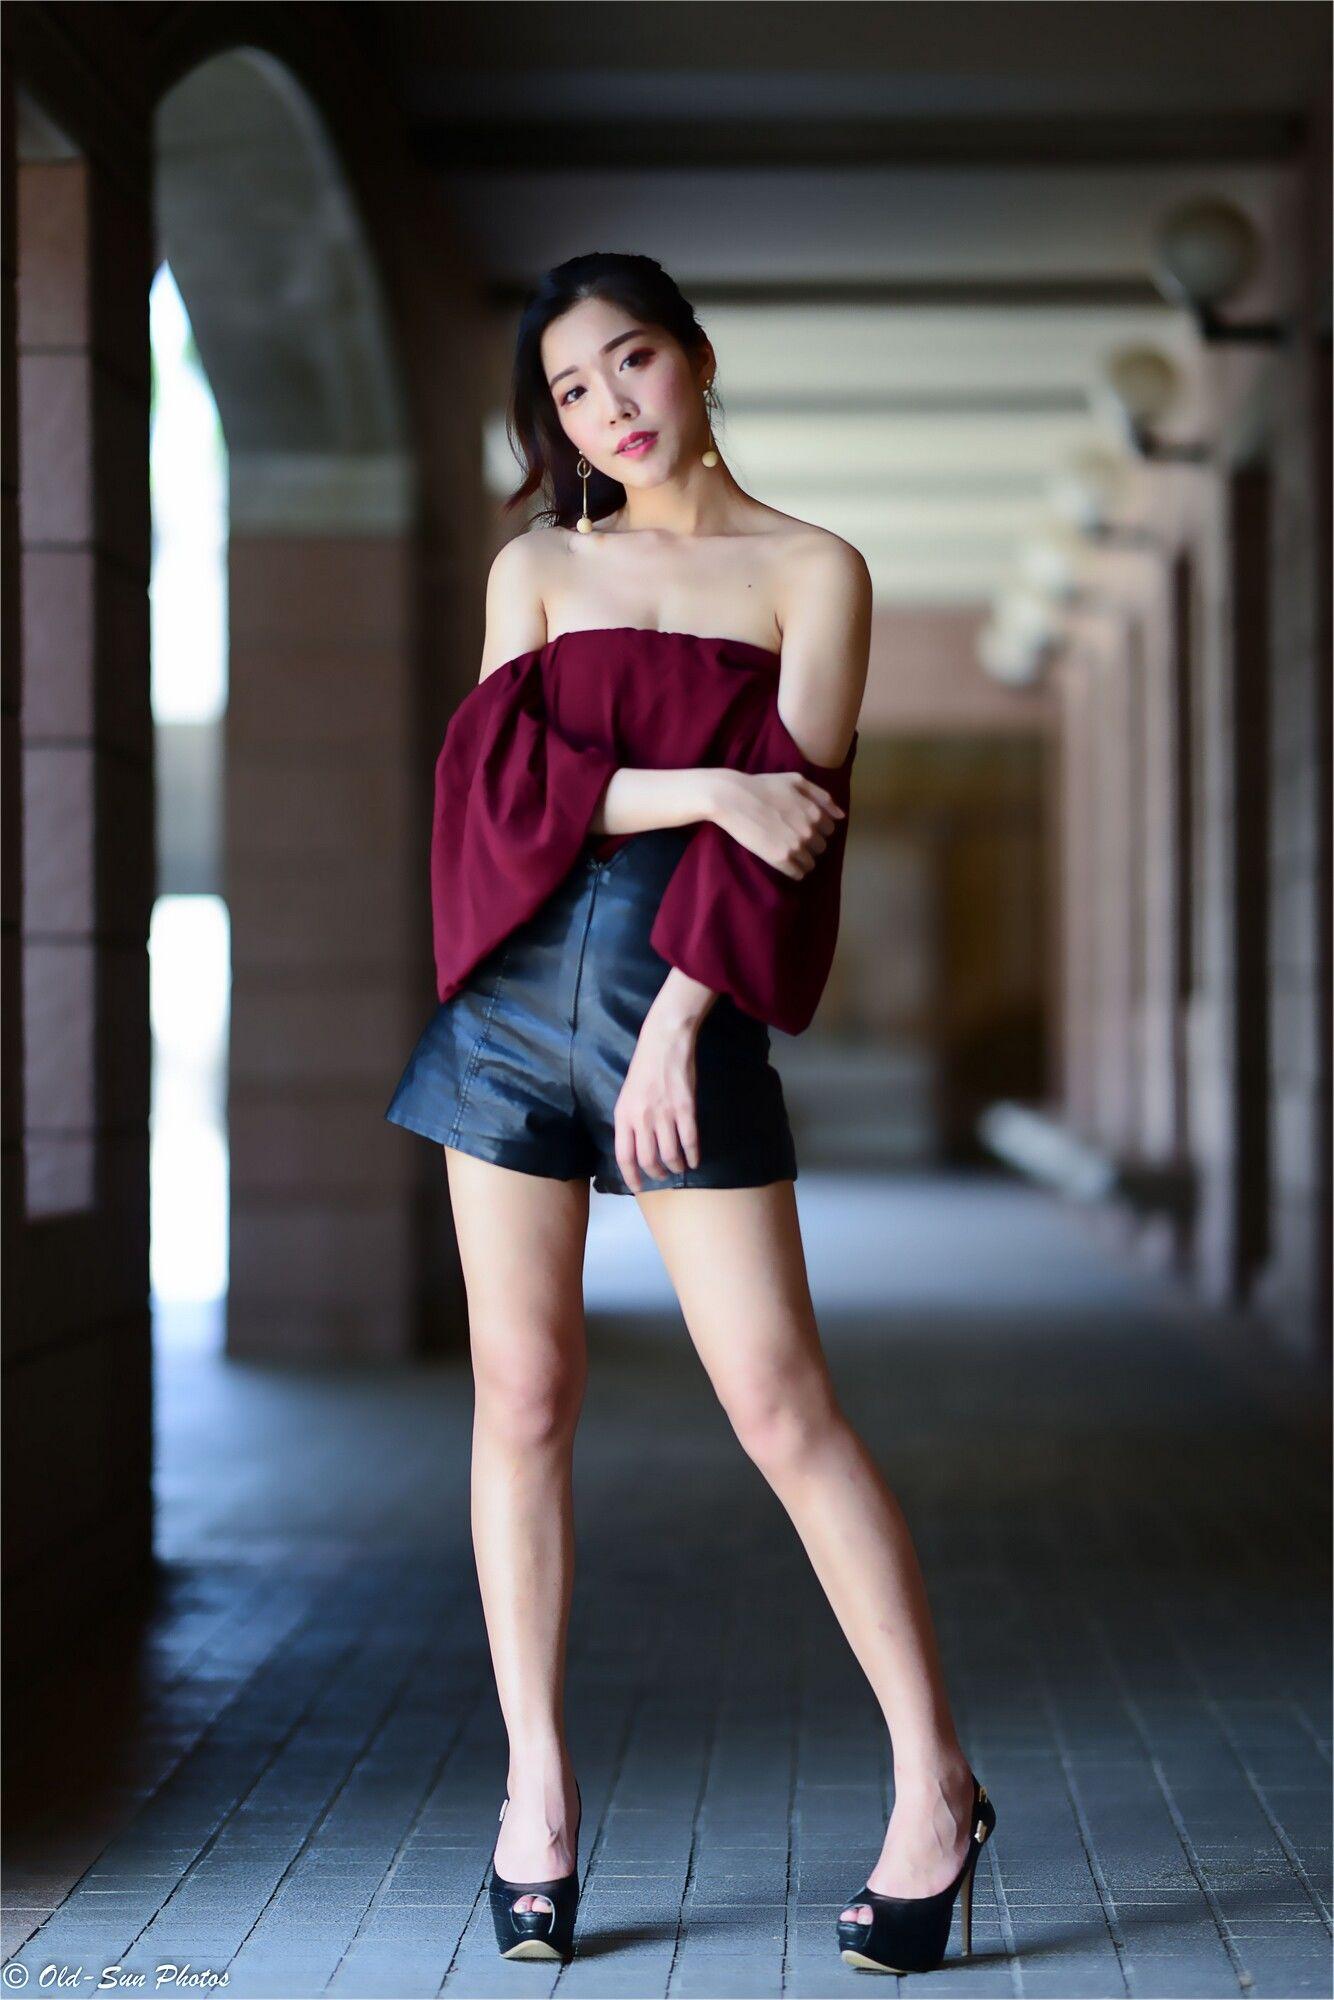 VOL.1376 [台湾正妹]高跟高贵优雅美女长腿美女街拍美臀:孙瑜莎莎(孙莎莎)超高清个人性感漂亮大图(80P)